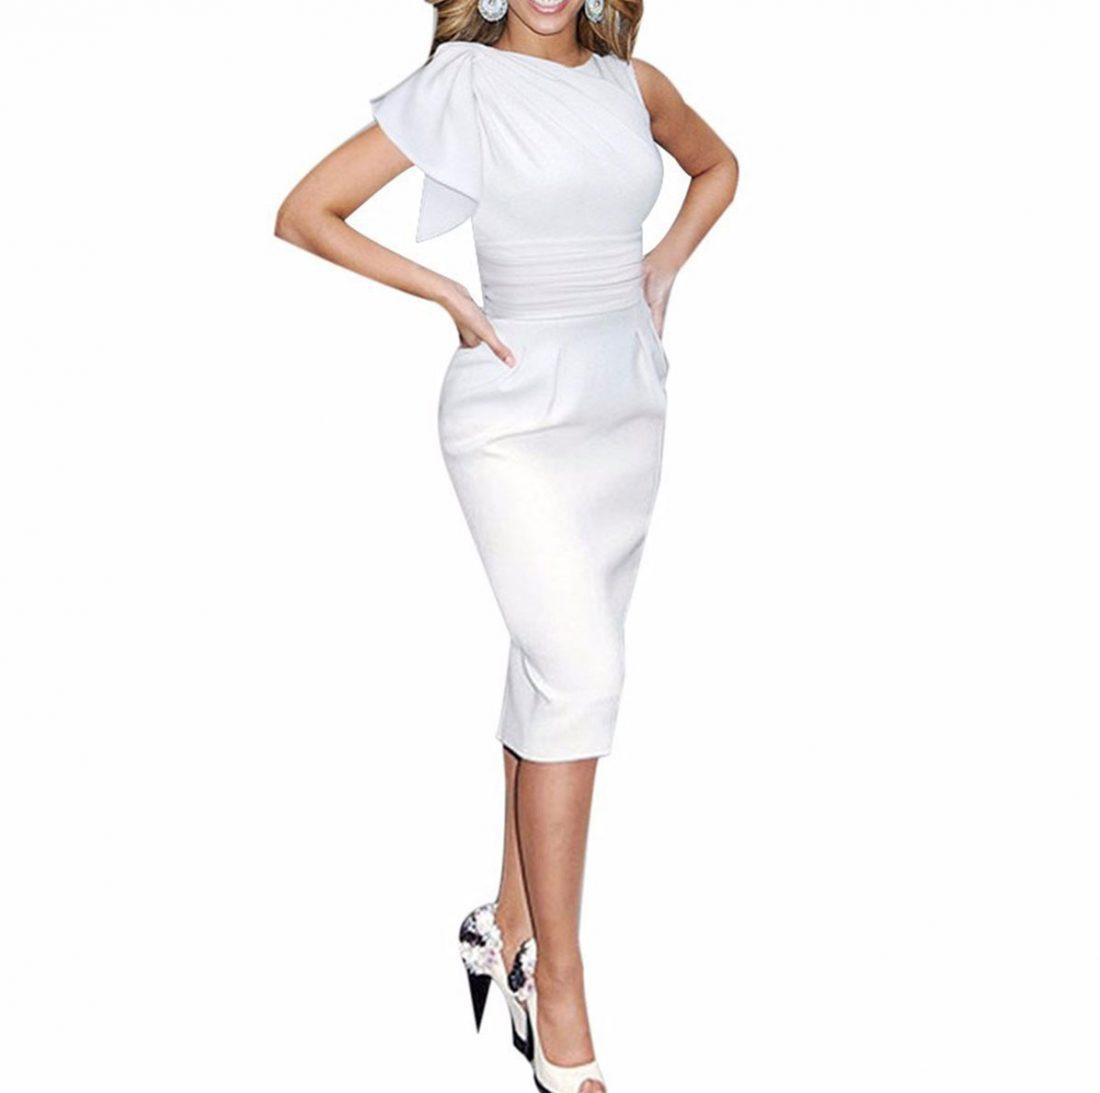 M0188 white1 Short Sleeve Dresses maureens.com boutique